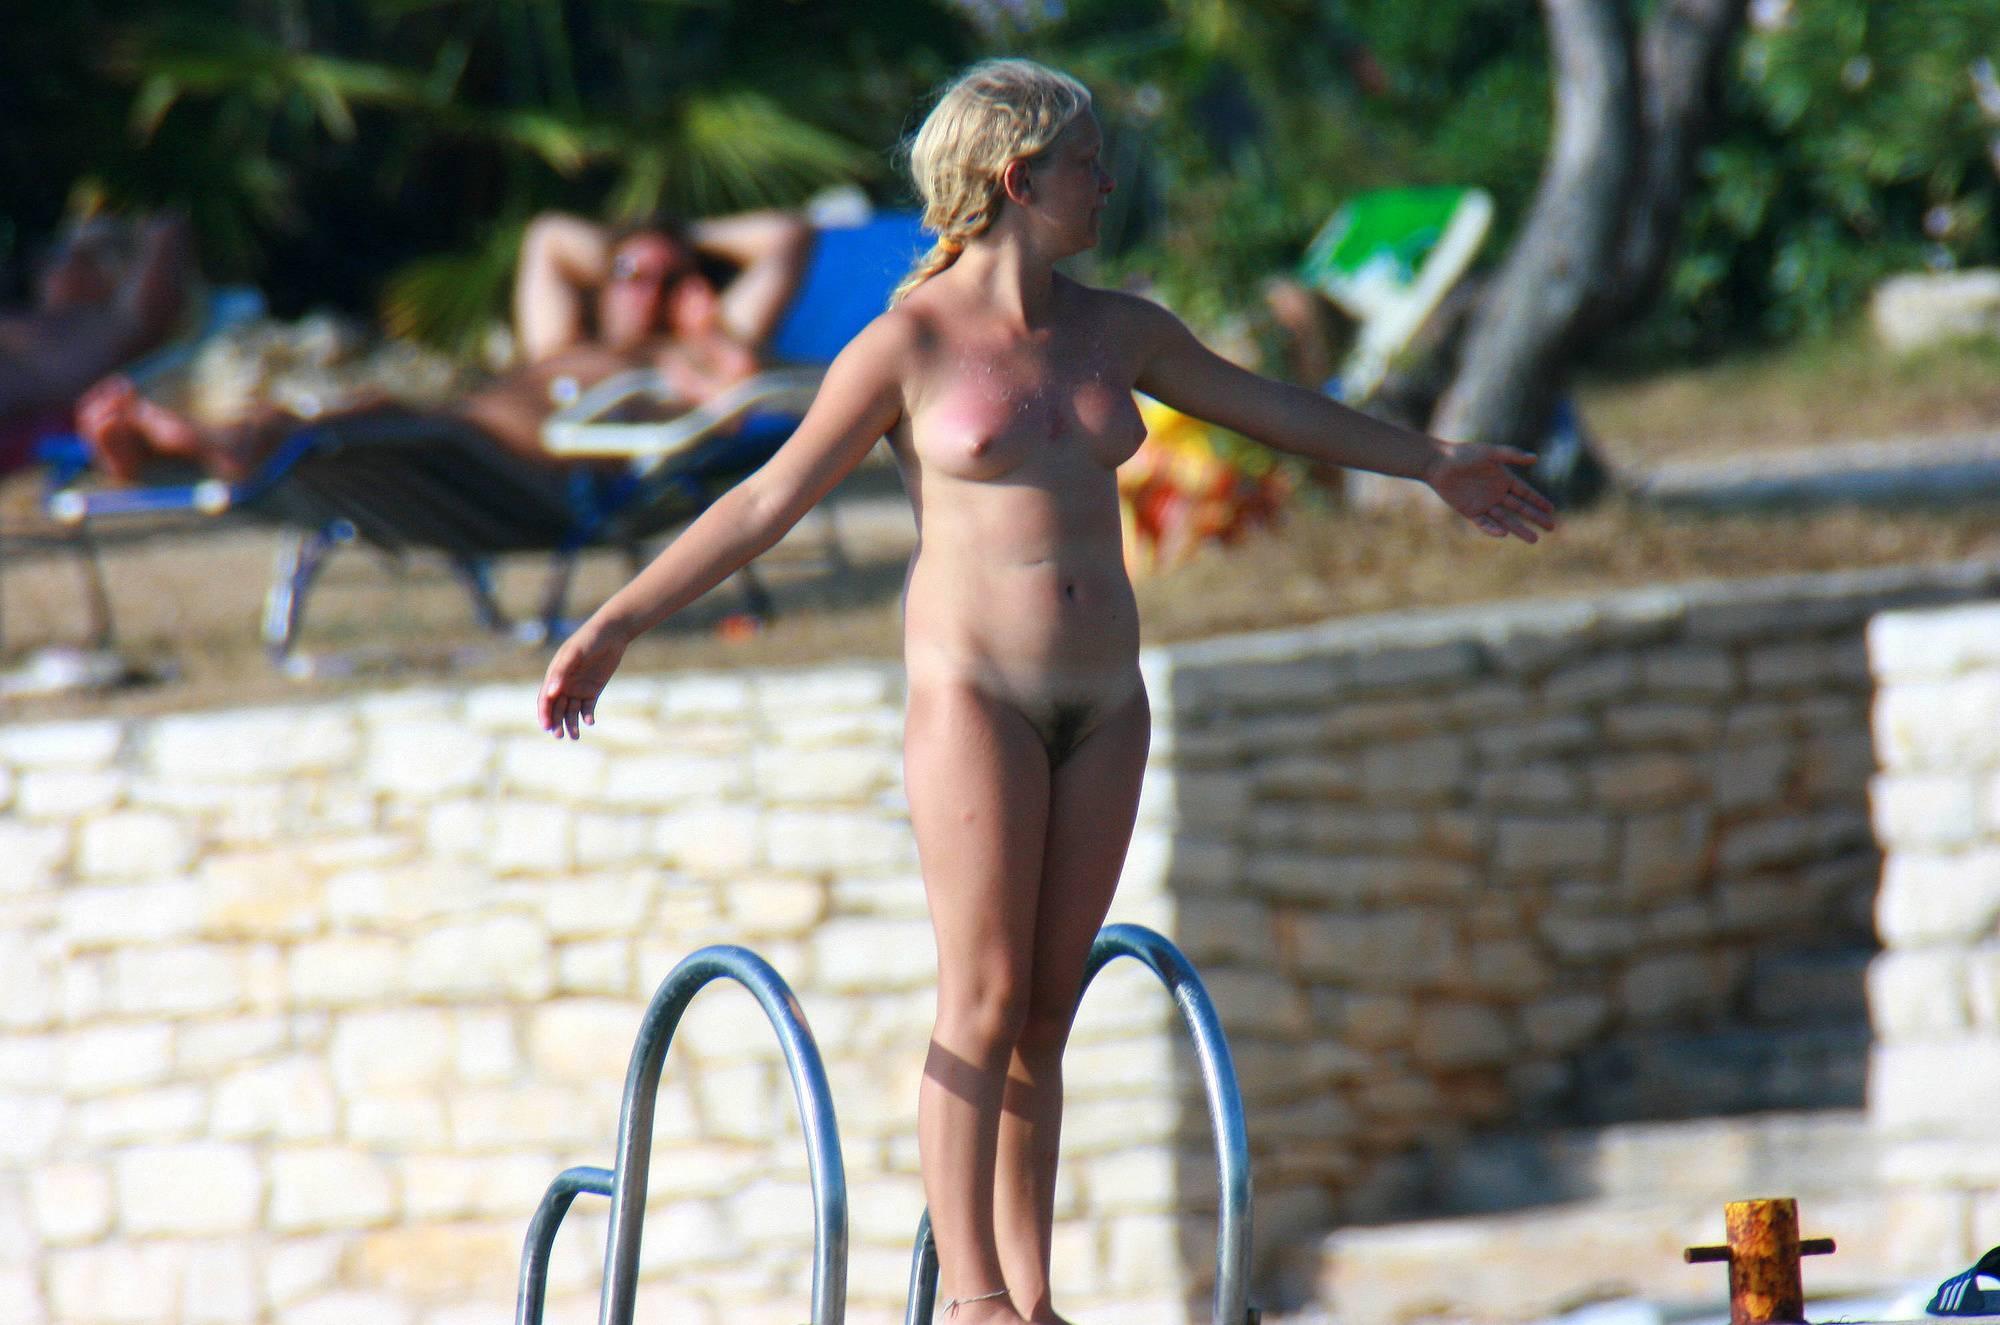 Pure Nudism Pics-Ula FKK Mom's Braided Girl - 3